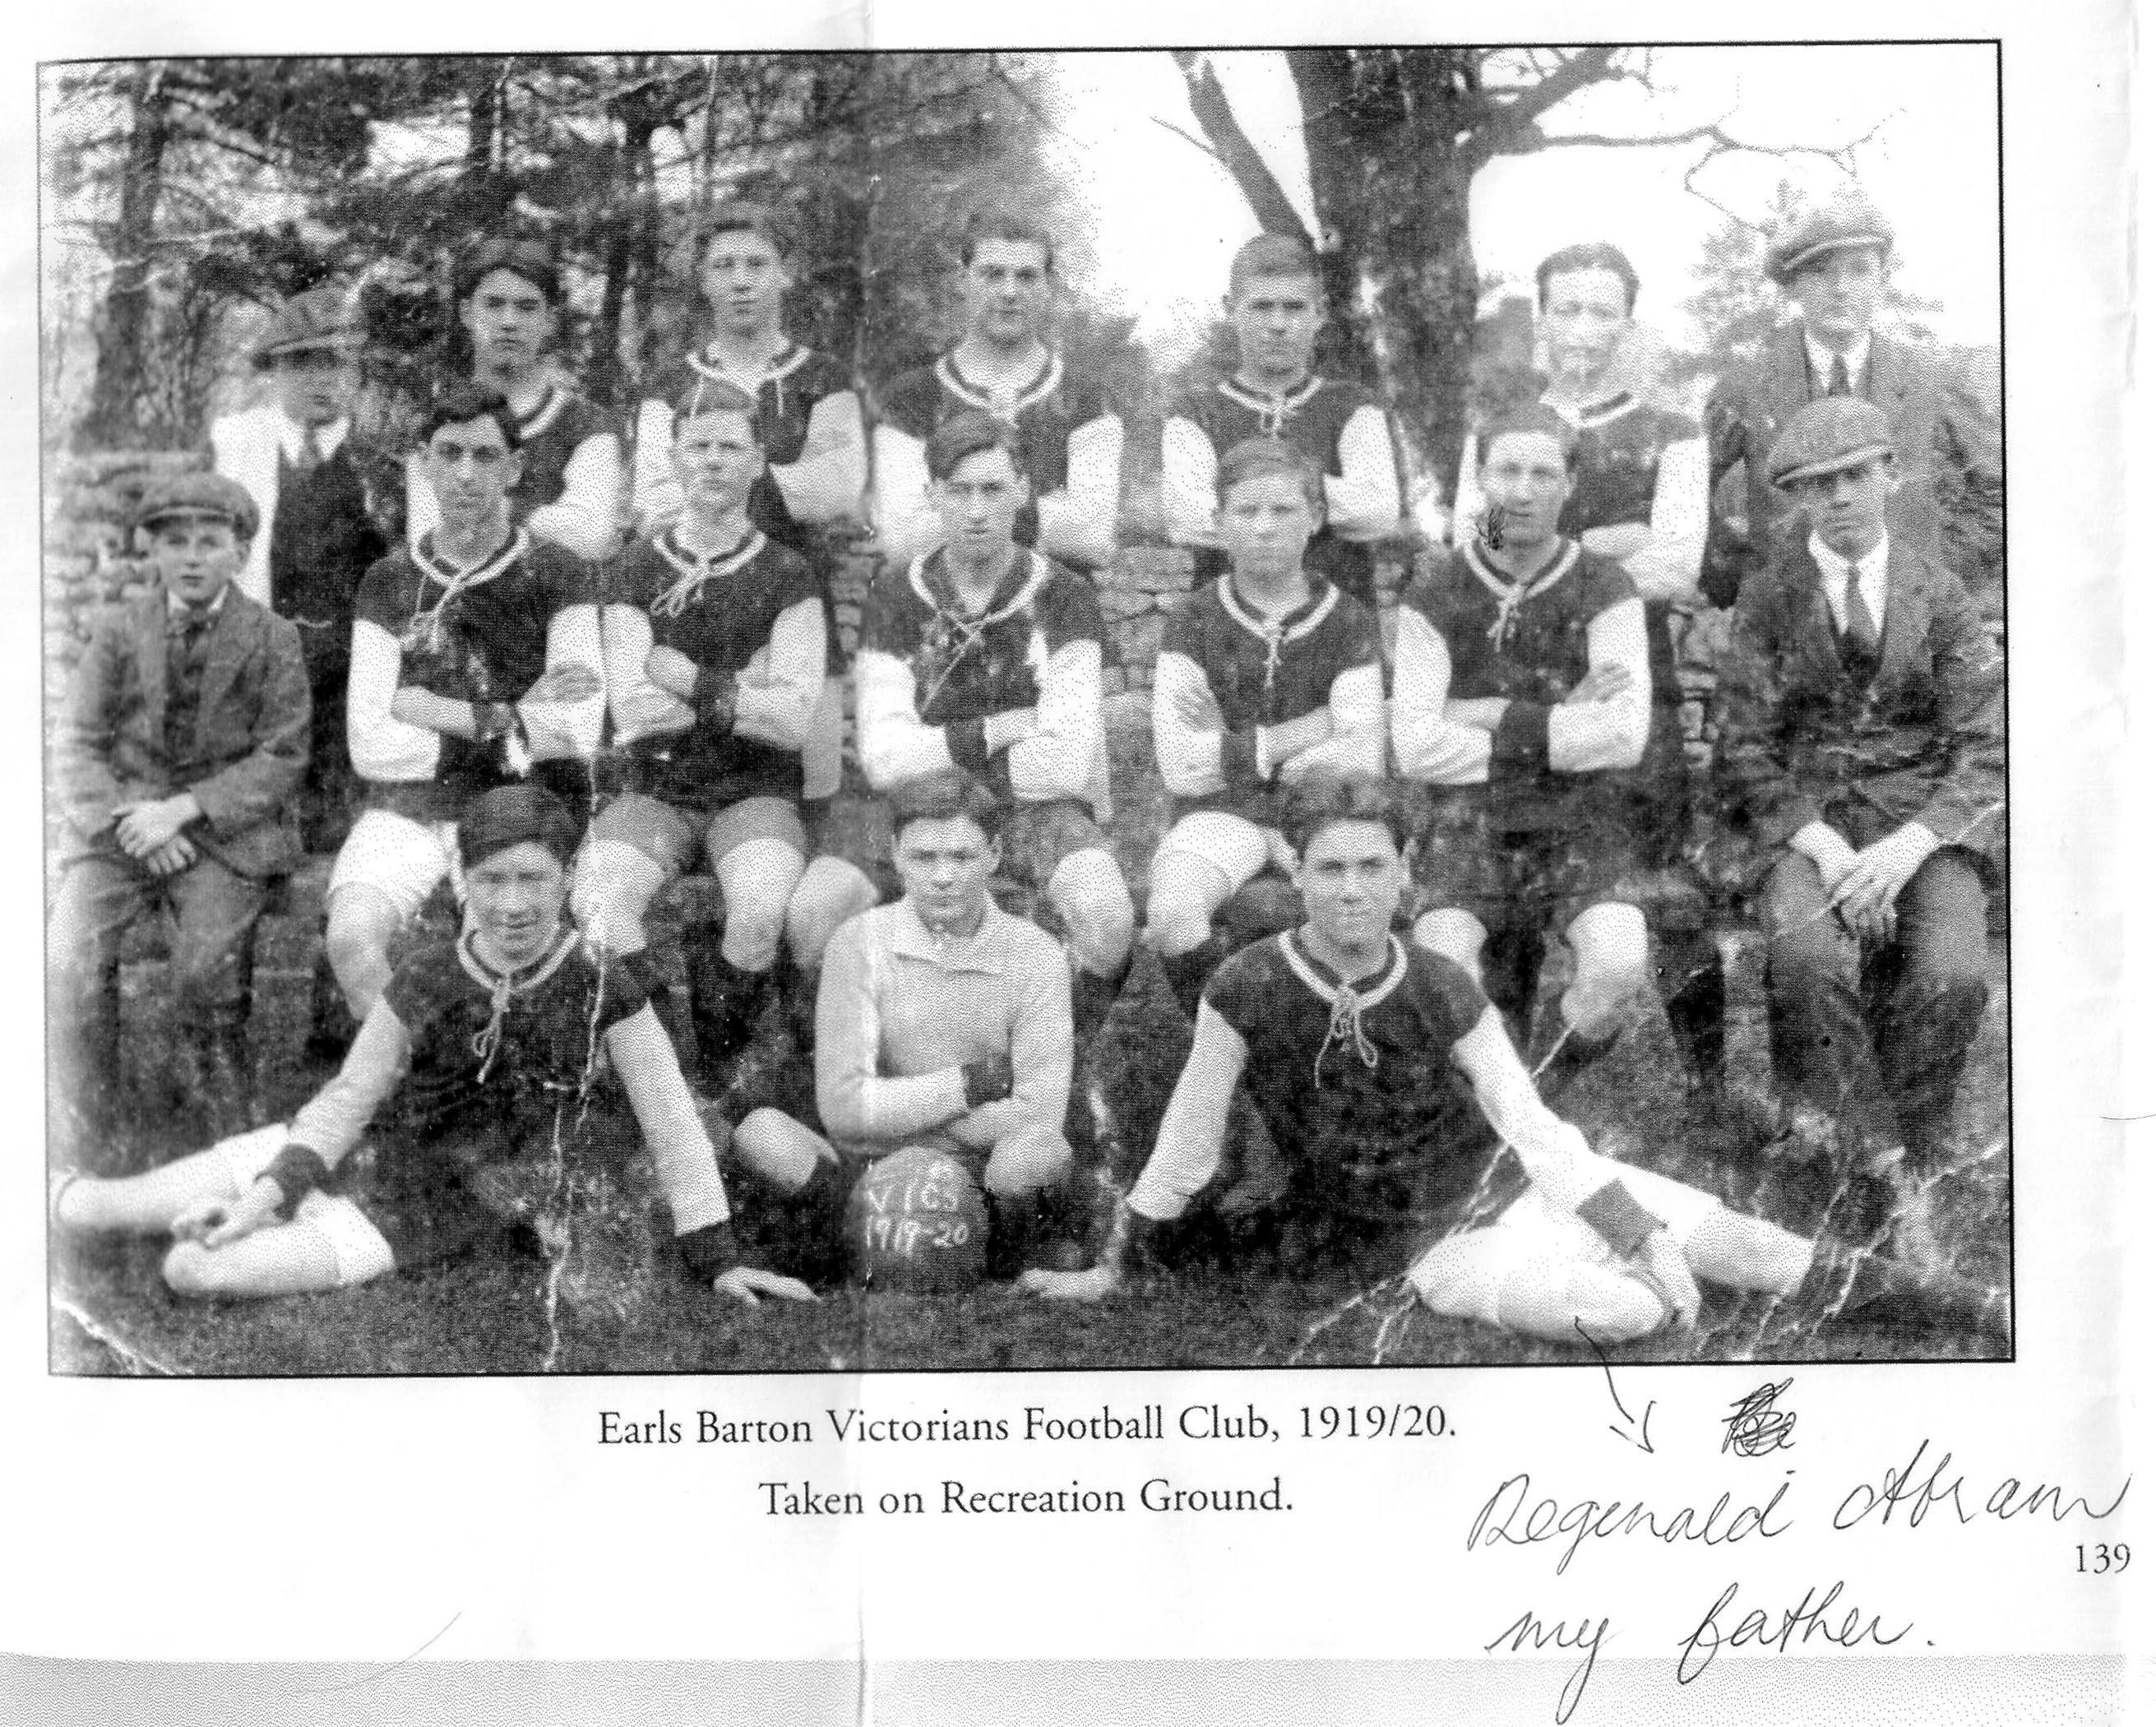 reginald-abram-football